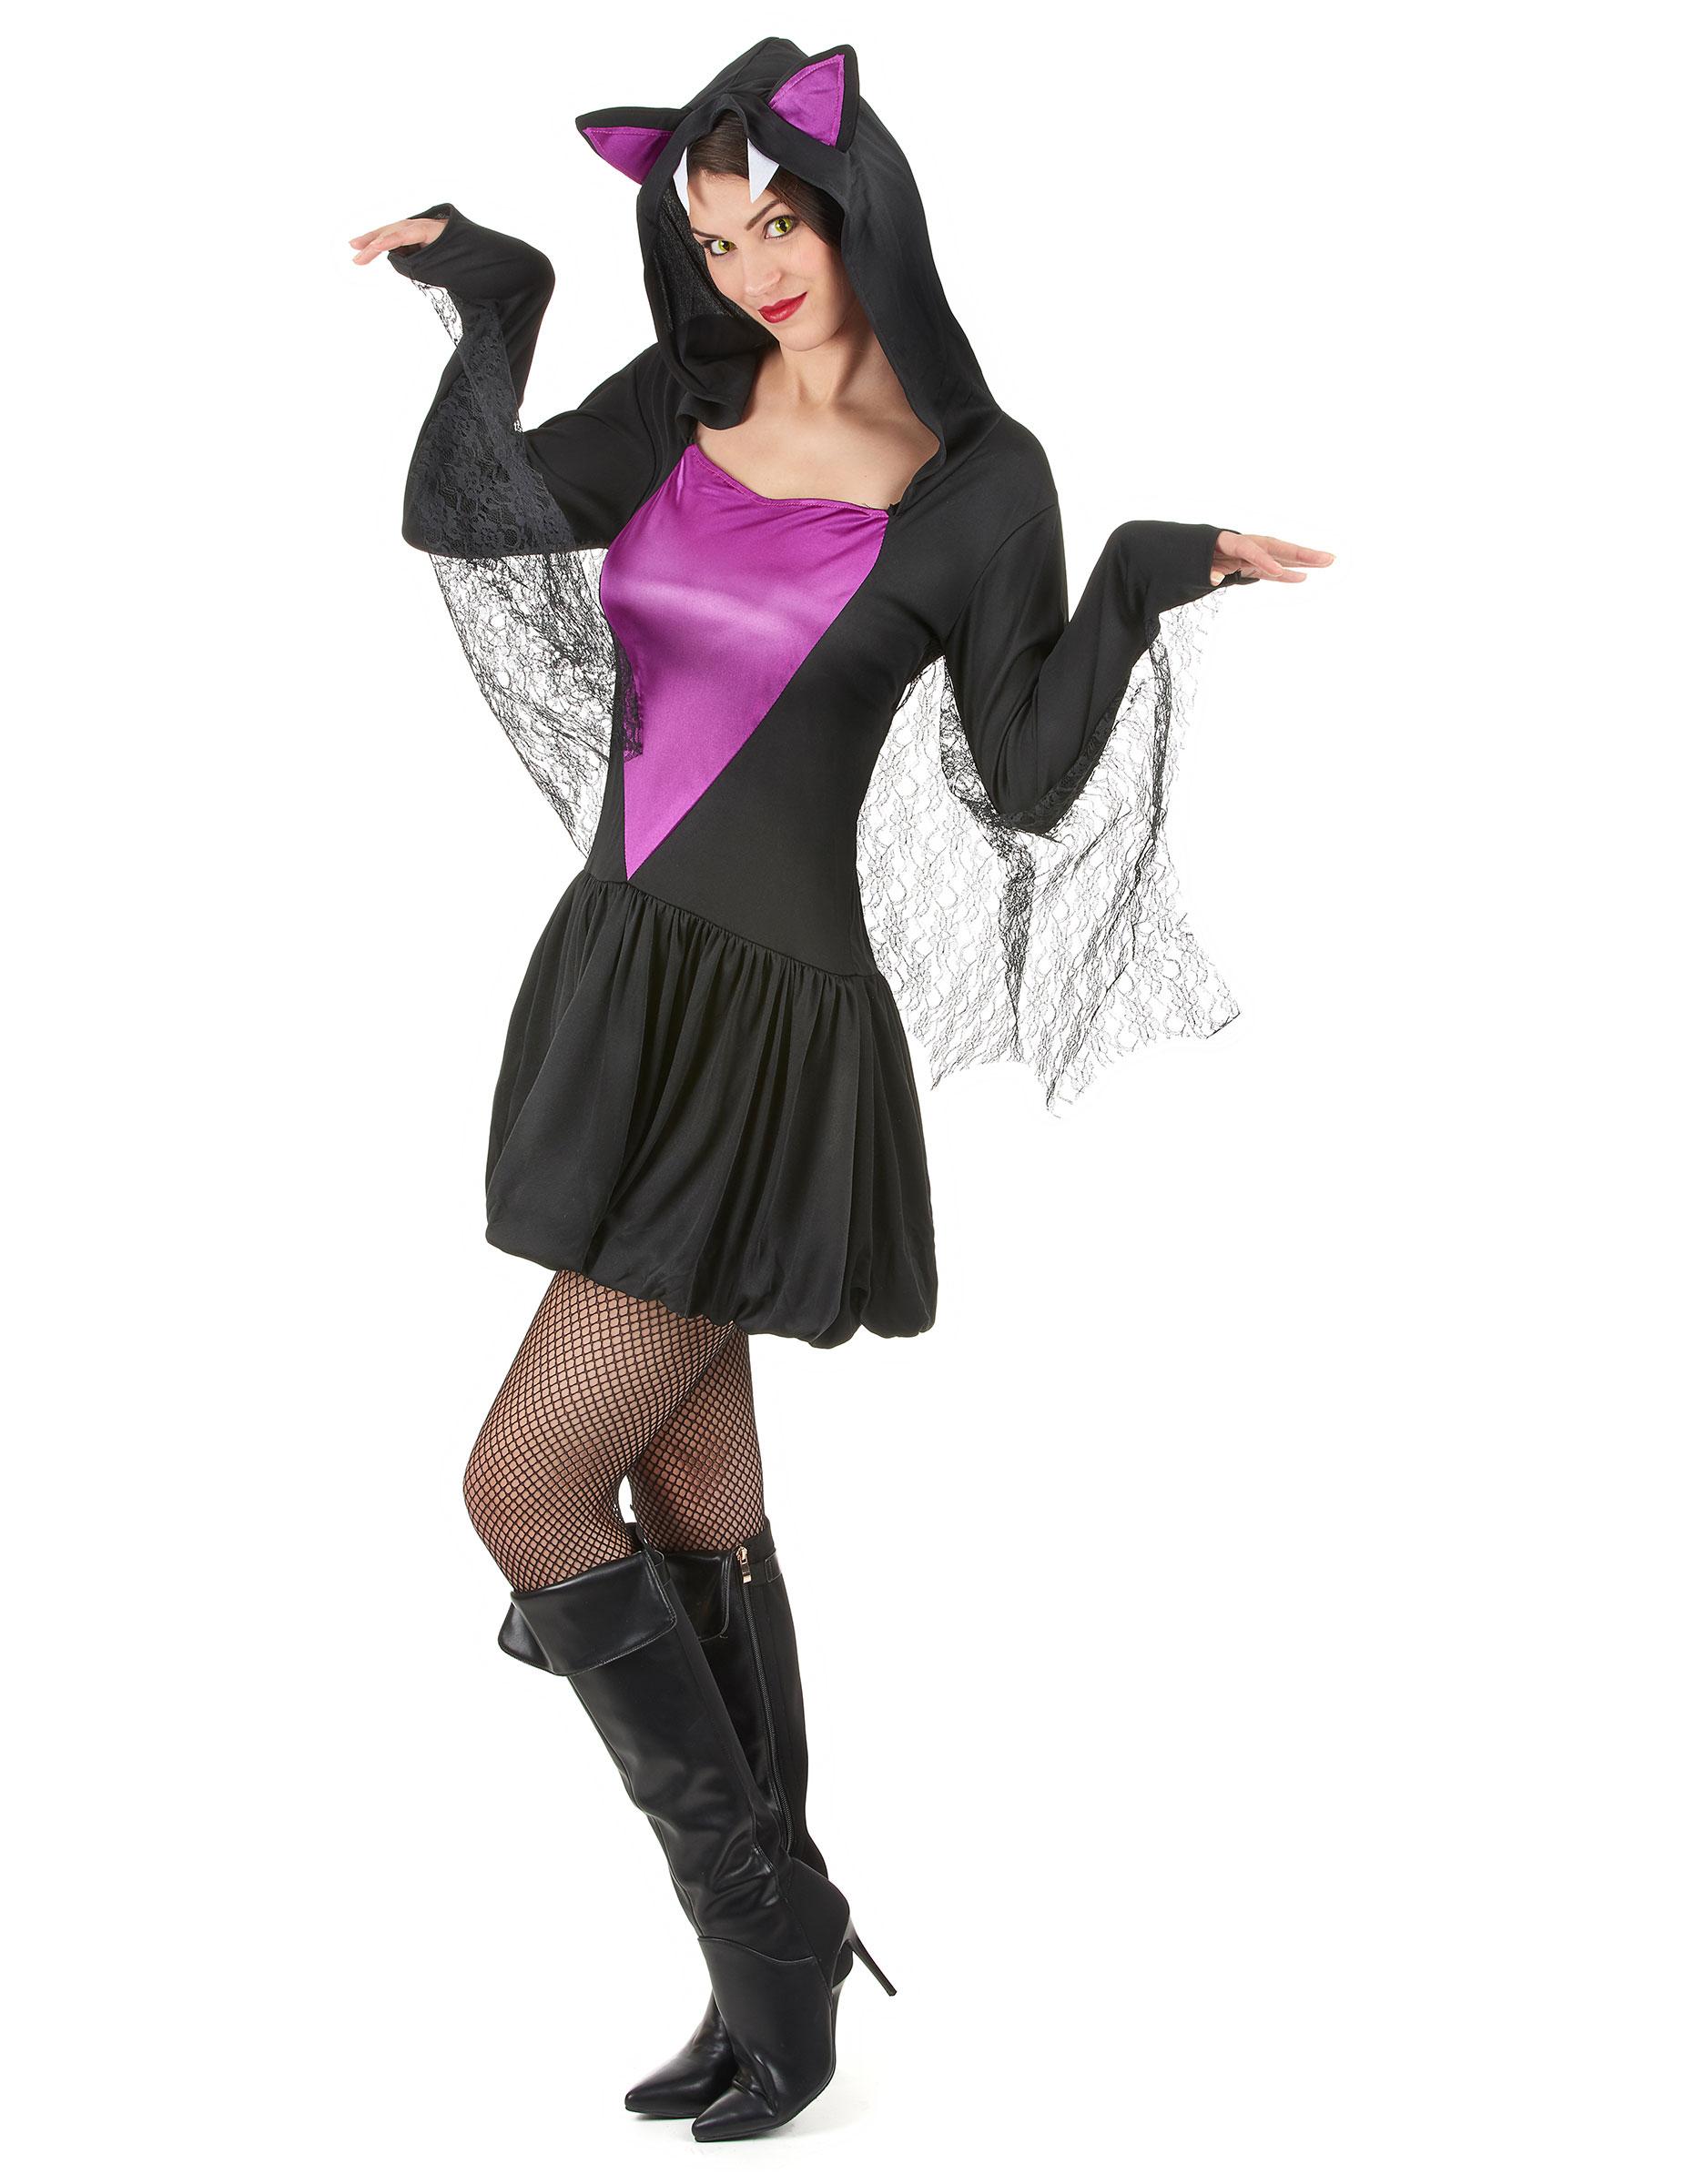 vampirfledermaus kost m f r frauen kost me f r erwachsene und g nstige faschingskost me vegaoo. Black Bedroom Furniture Sets. Home Design Ideas